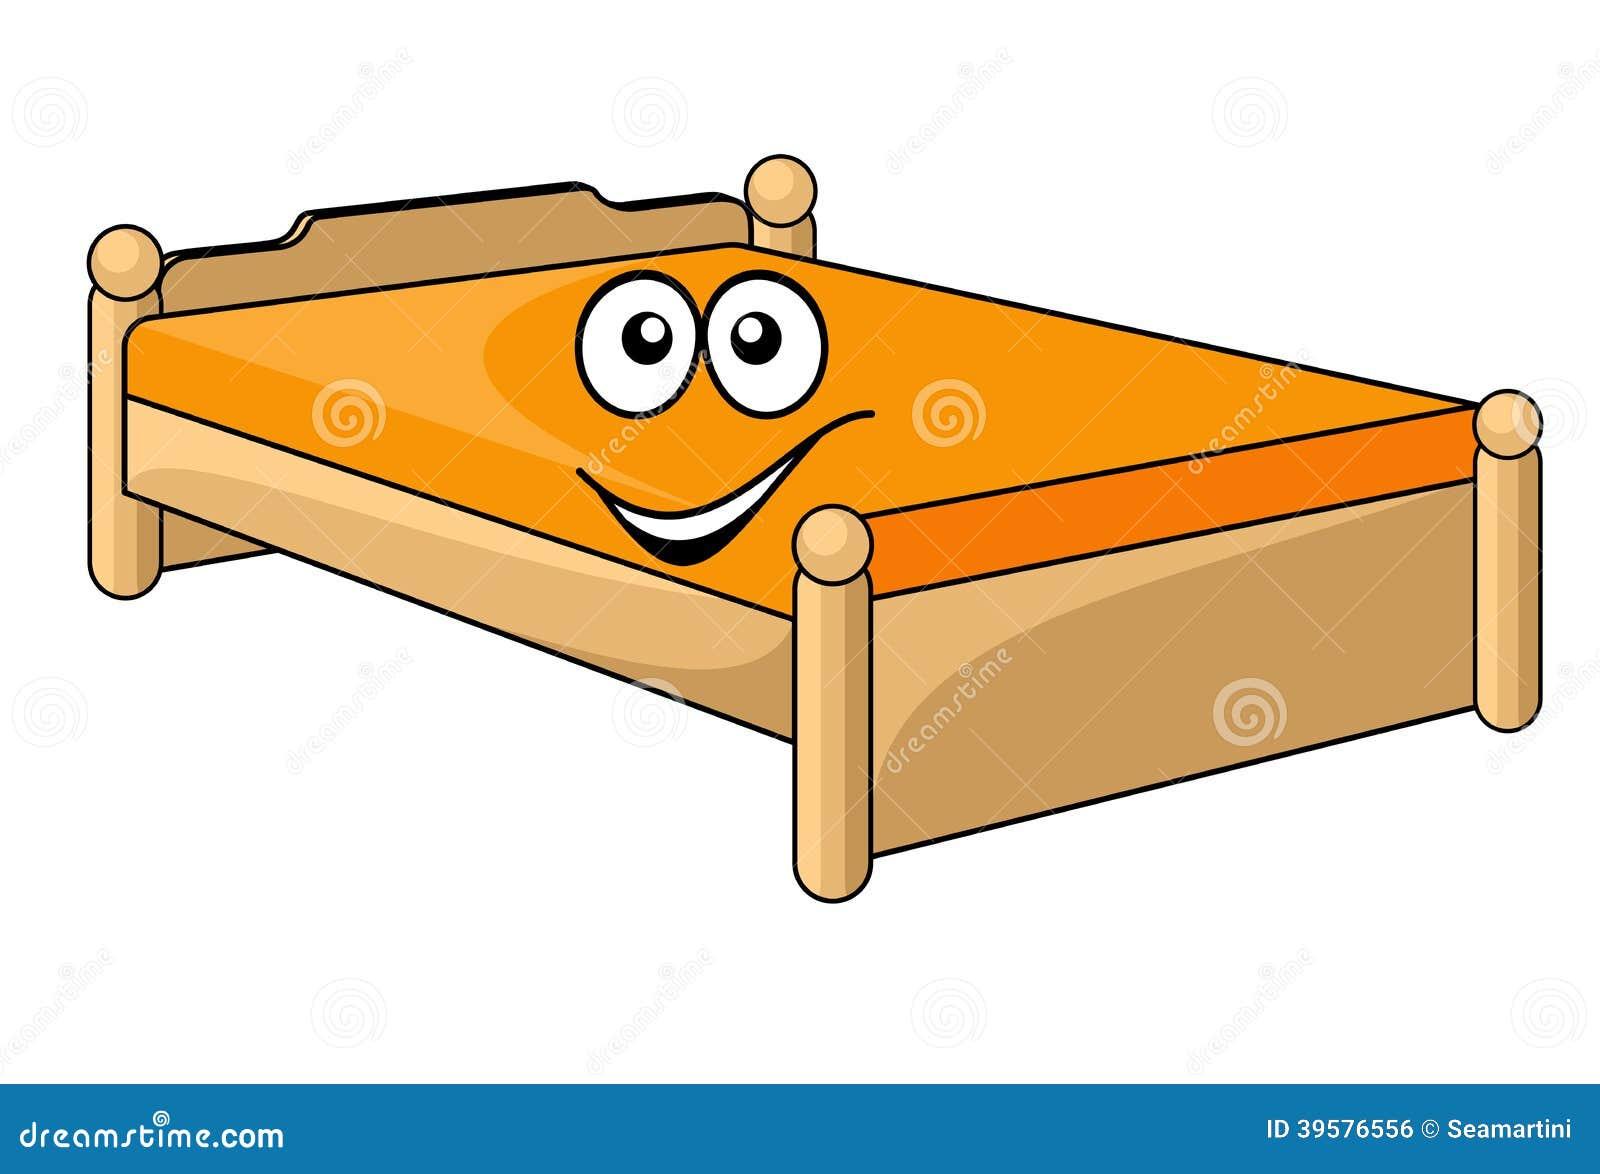 Comfortable Cartoon Bed Stock Vector Image 39576556